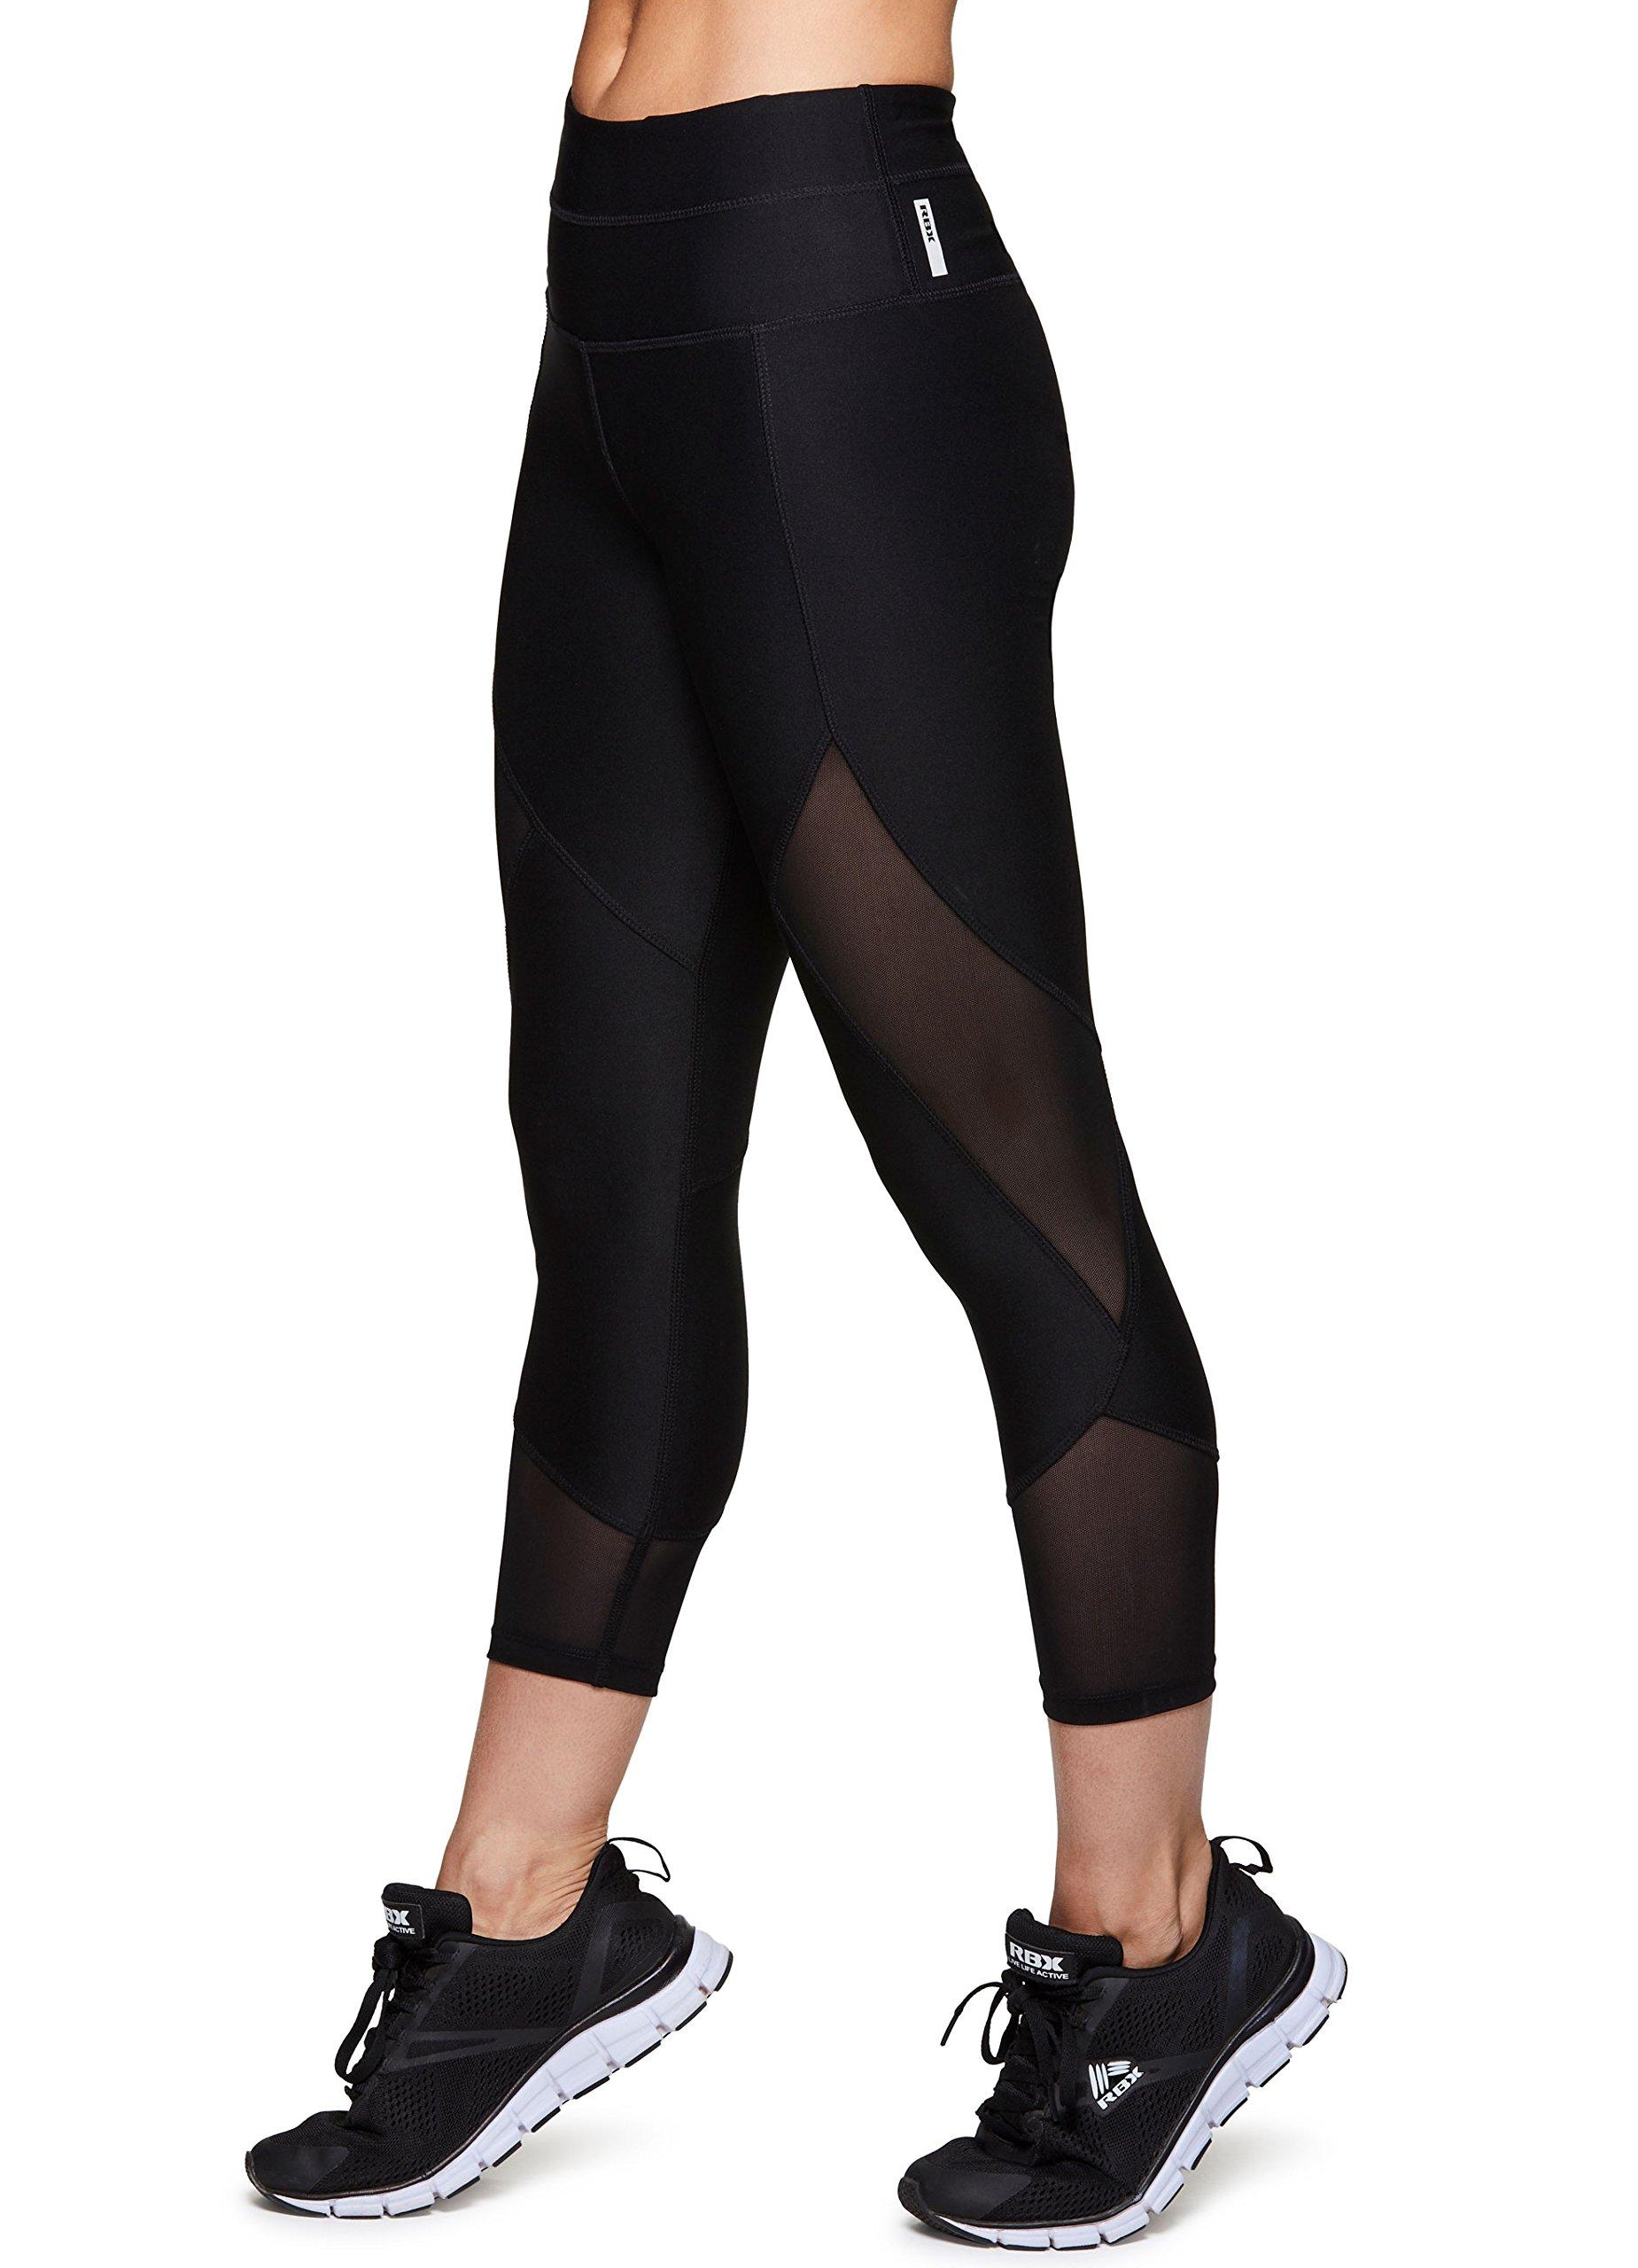 RBX Active Women's Yoga Capri Mesh Leggings Black M